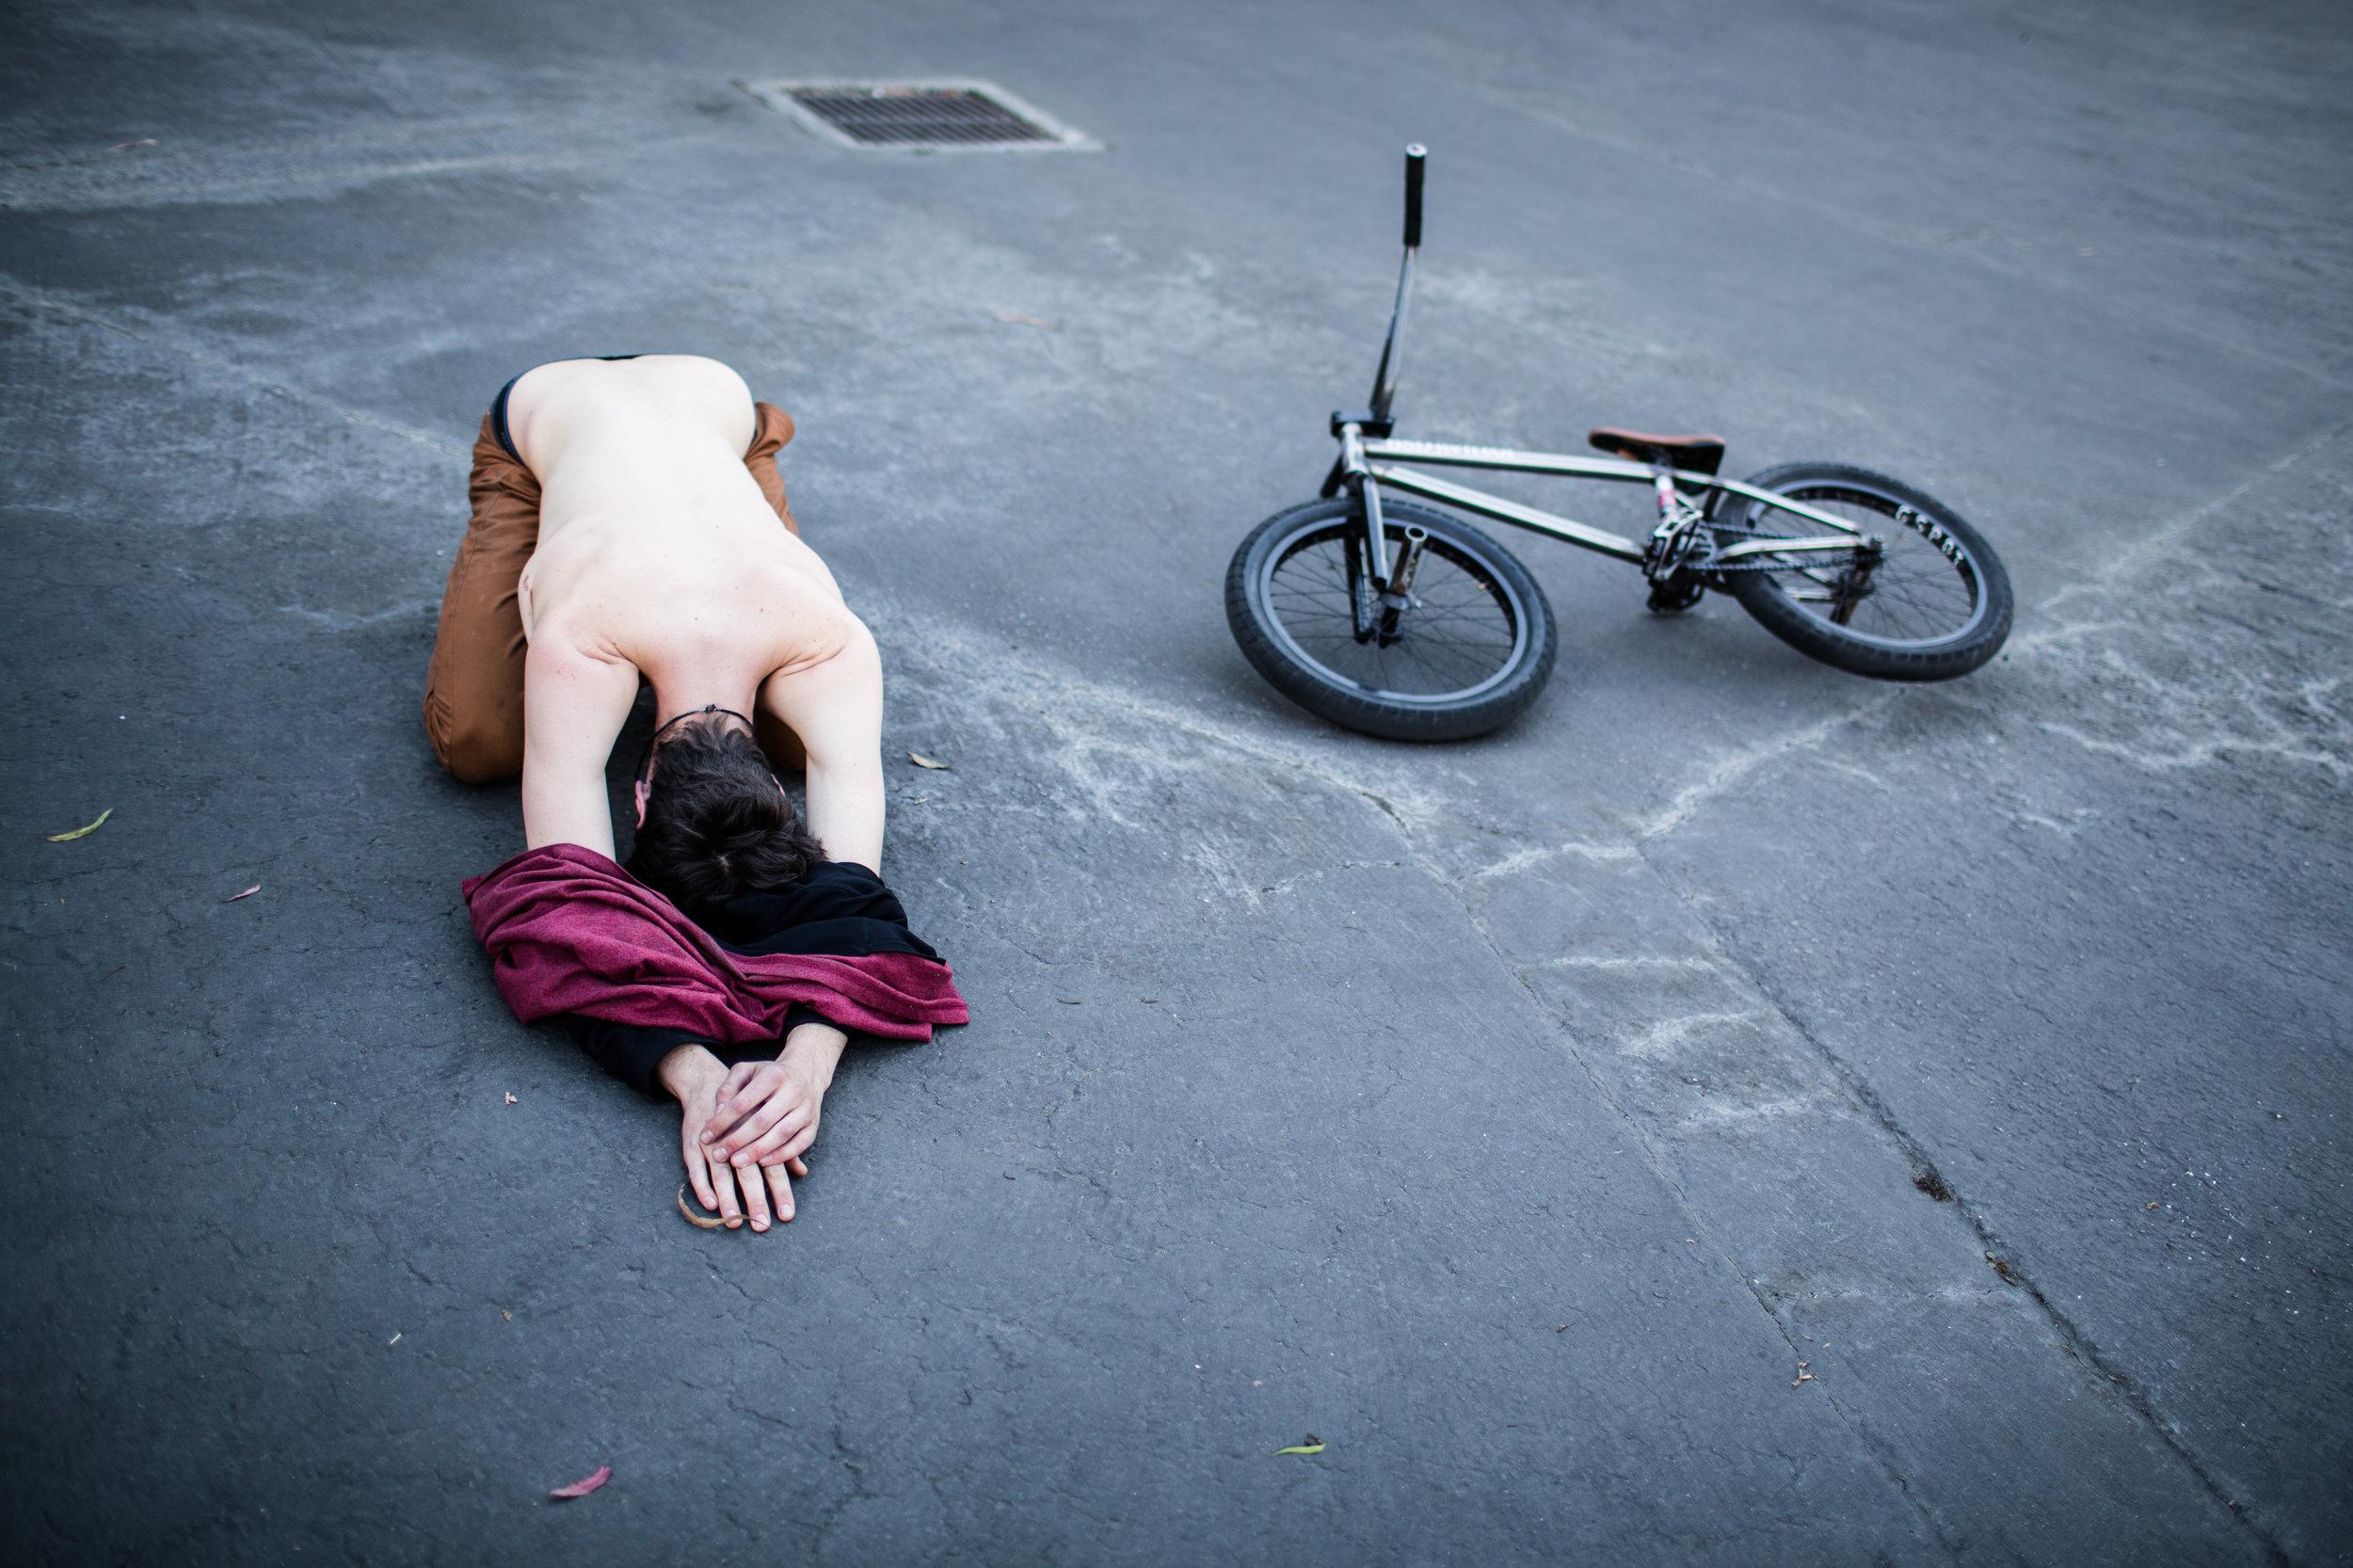 David-Grant-BMX-Stretching-Fall-Devin-Feil.jpg